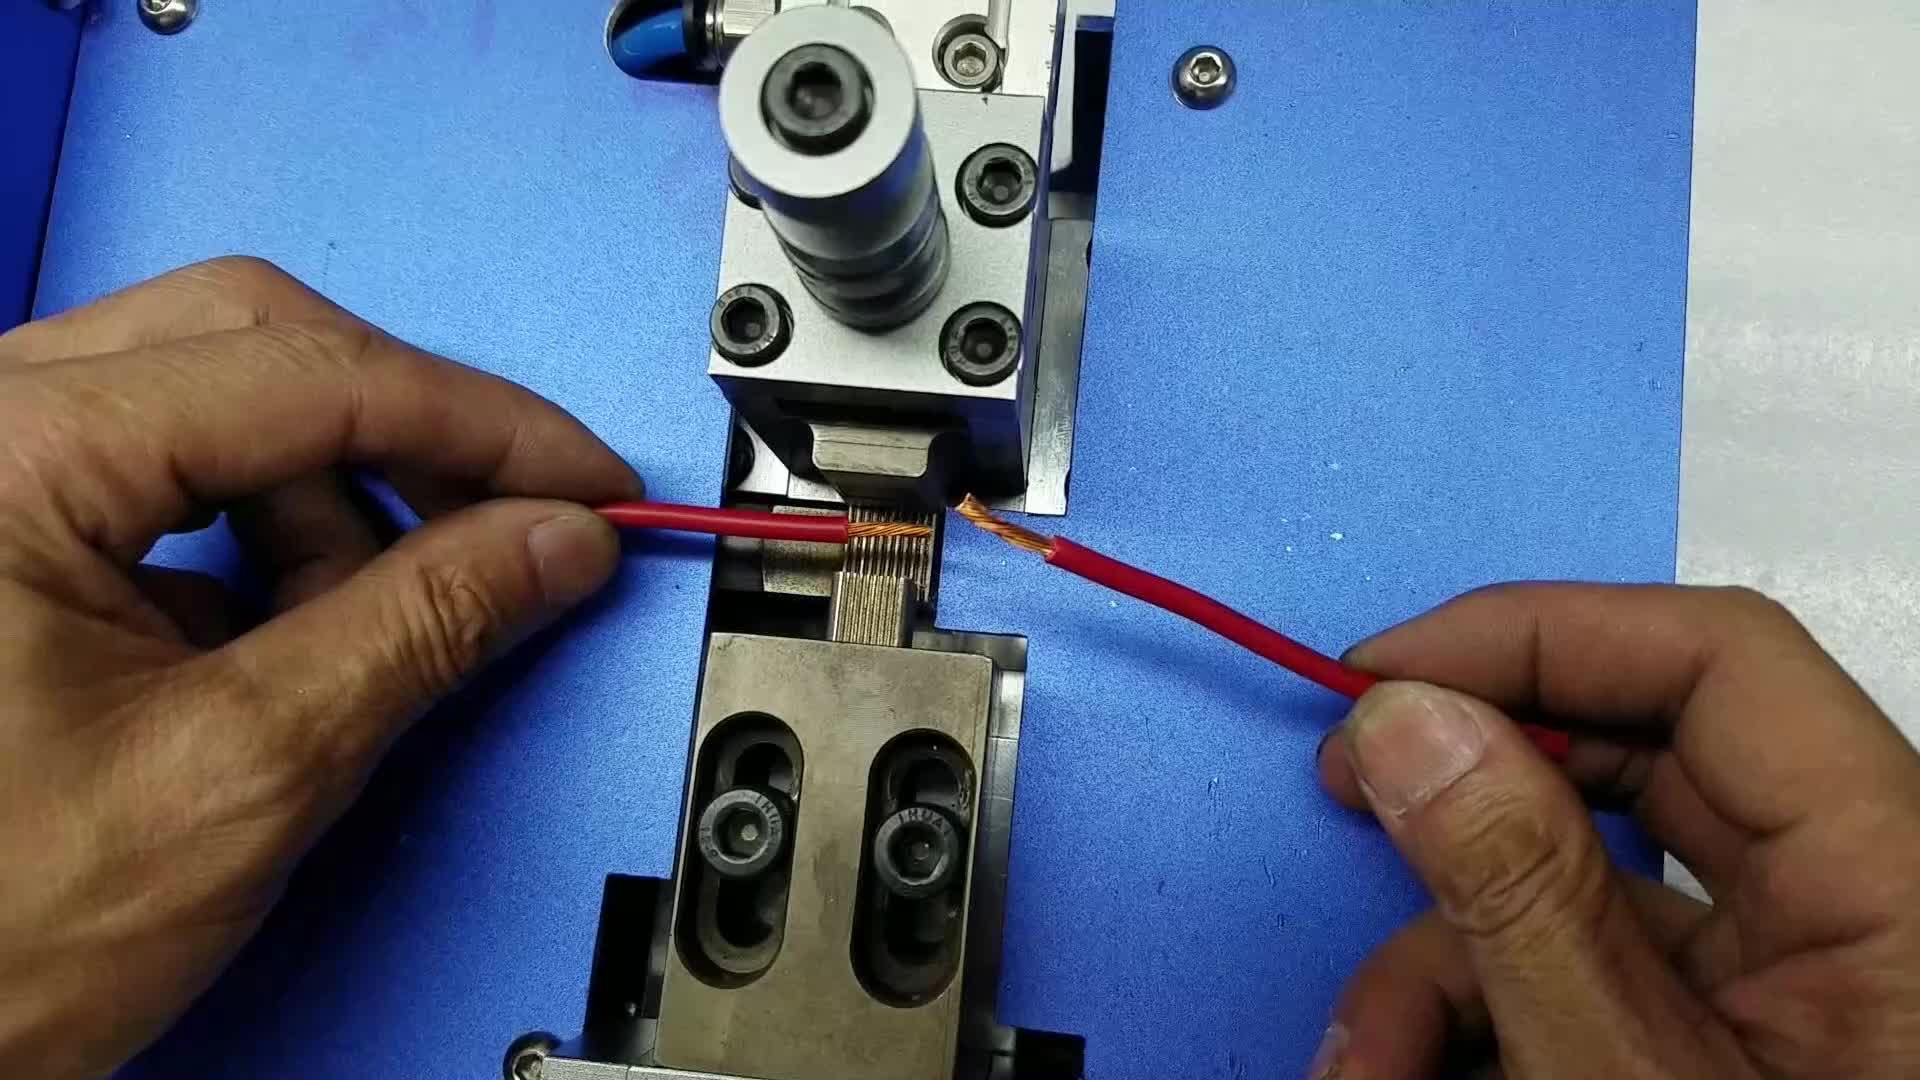 Ultrasonic Amp Crimp Tool Welding Machine For Wire Splice Buy Wiring A Welder